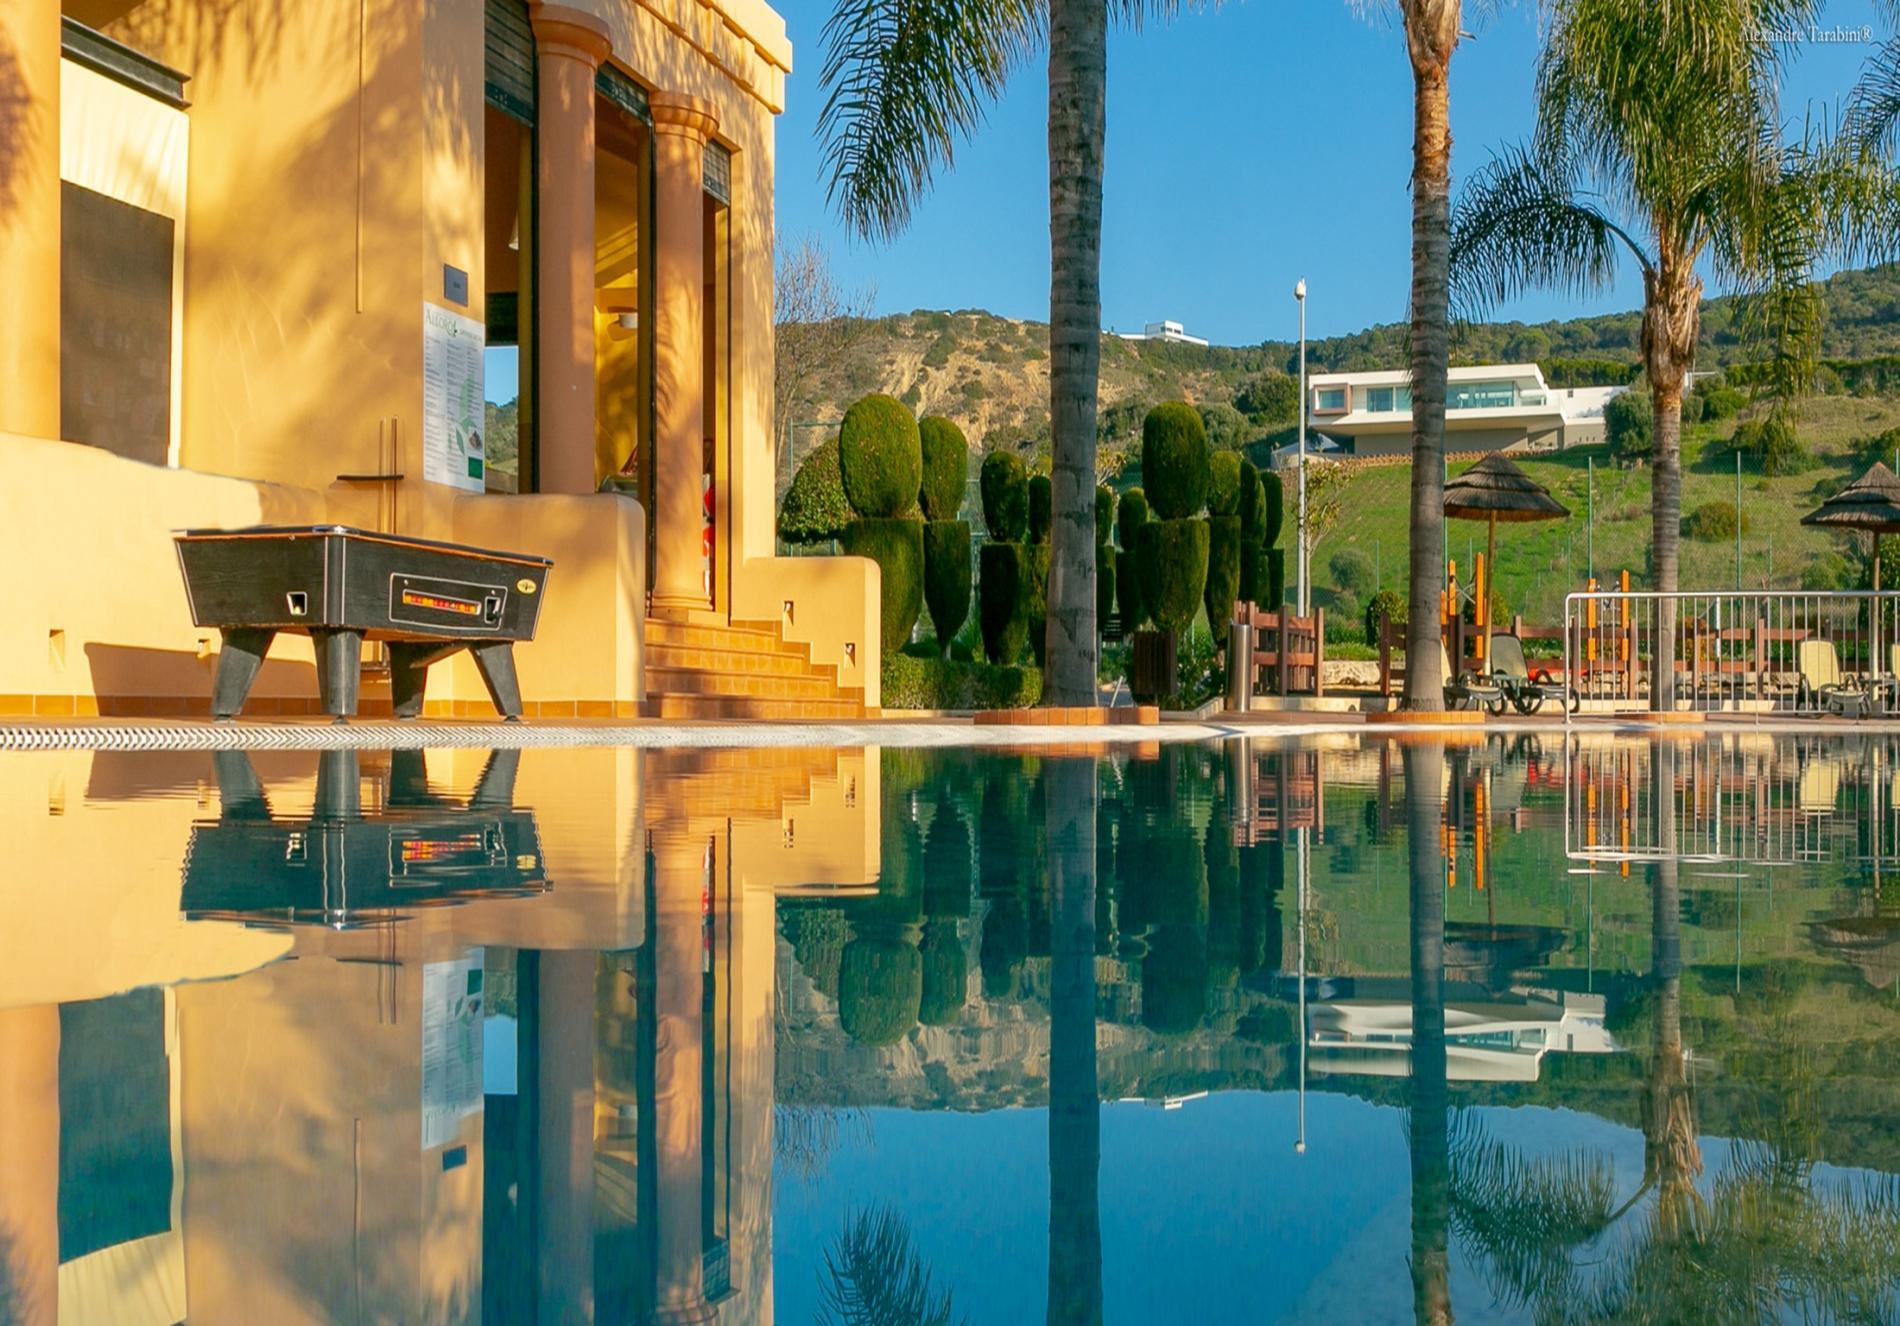 Ferienwohnung A24 - LuzBay Beach Apartment (2558091), Luz, , Algarve, Portugal, Bild 31